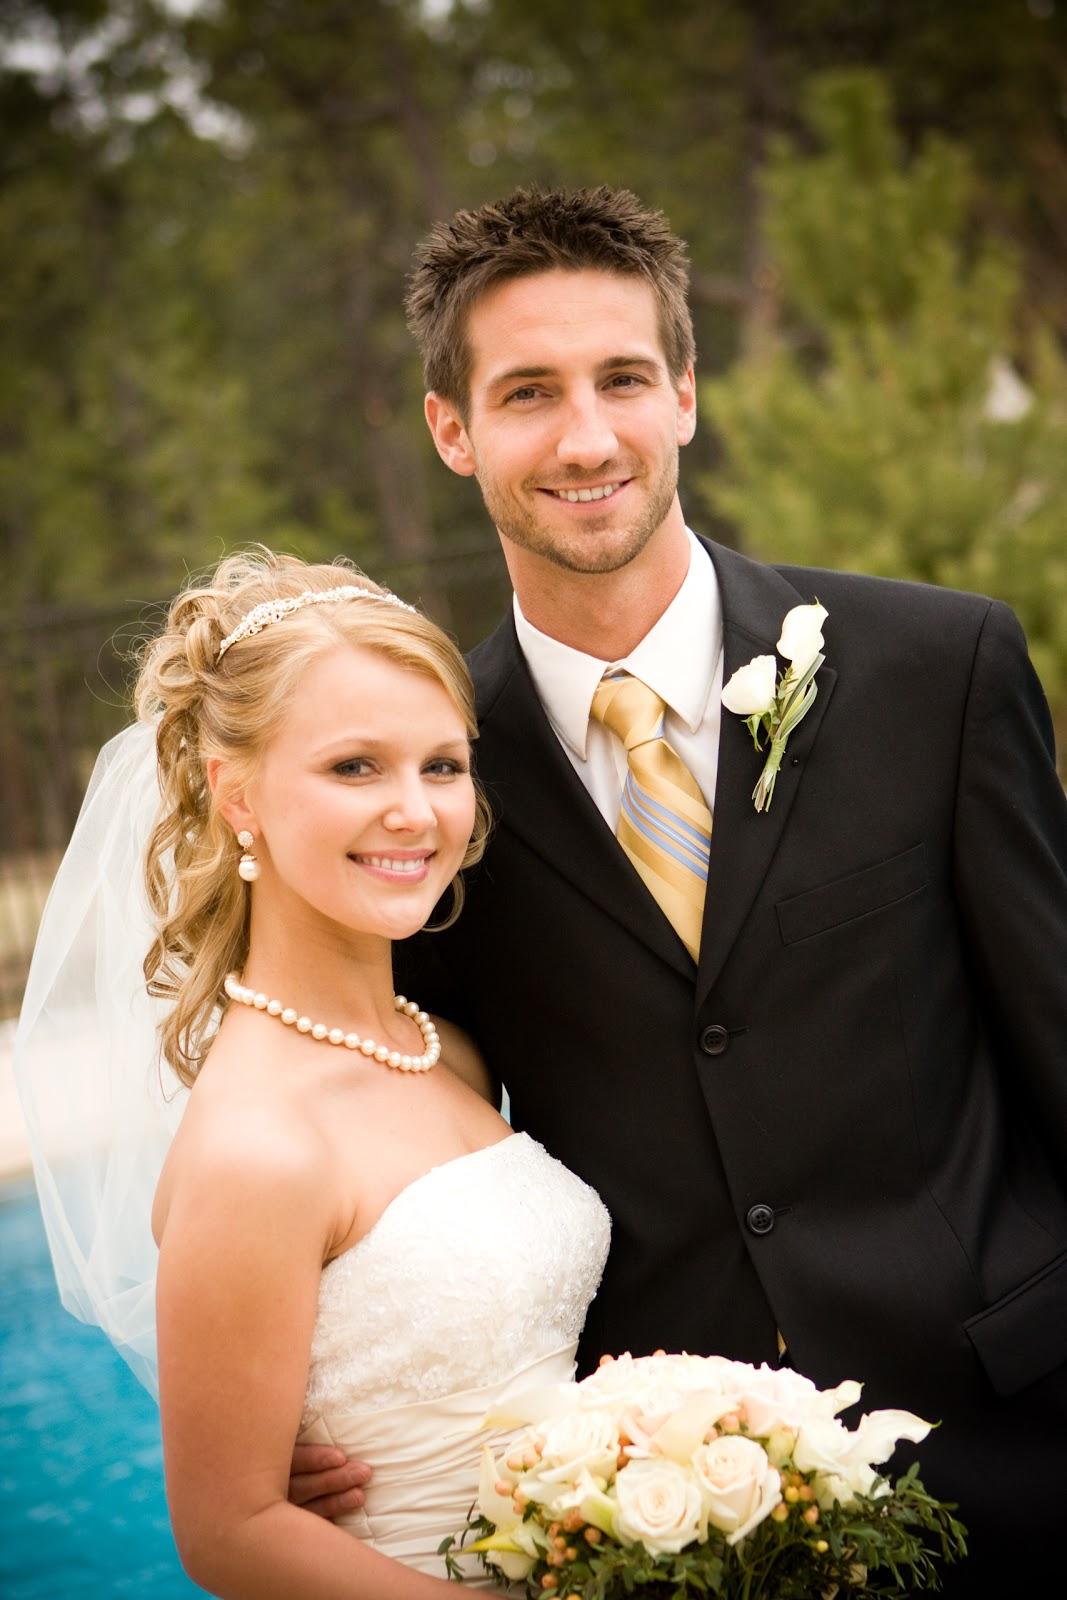 Mia newman wedding